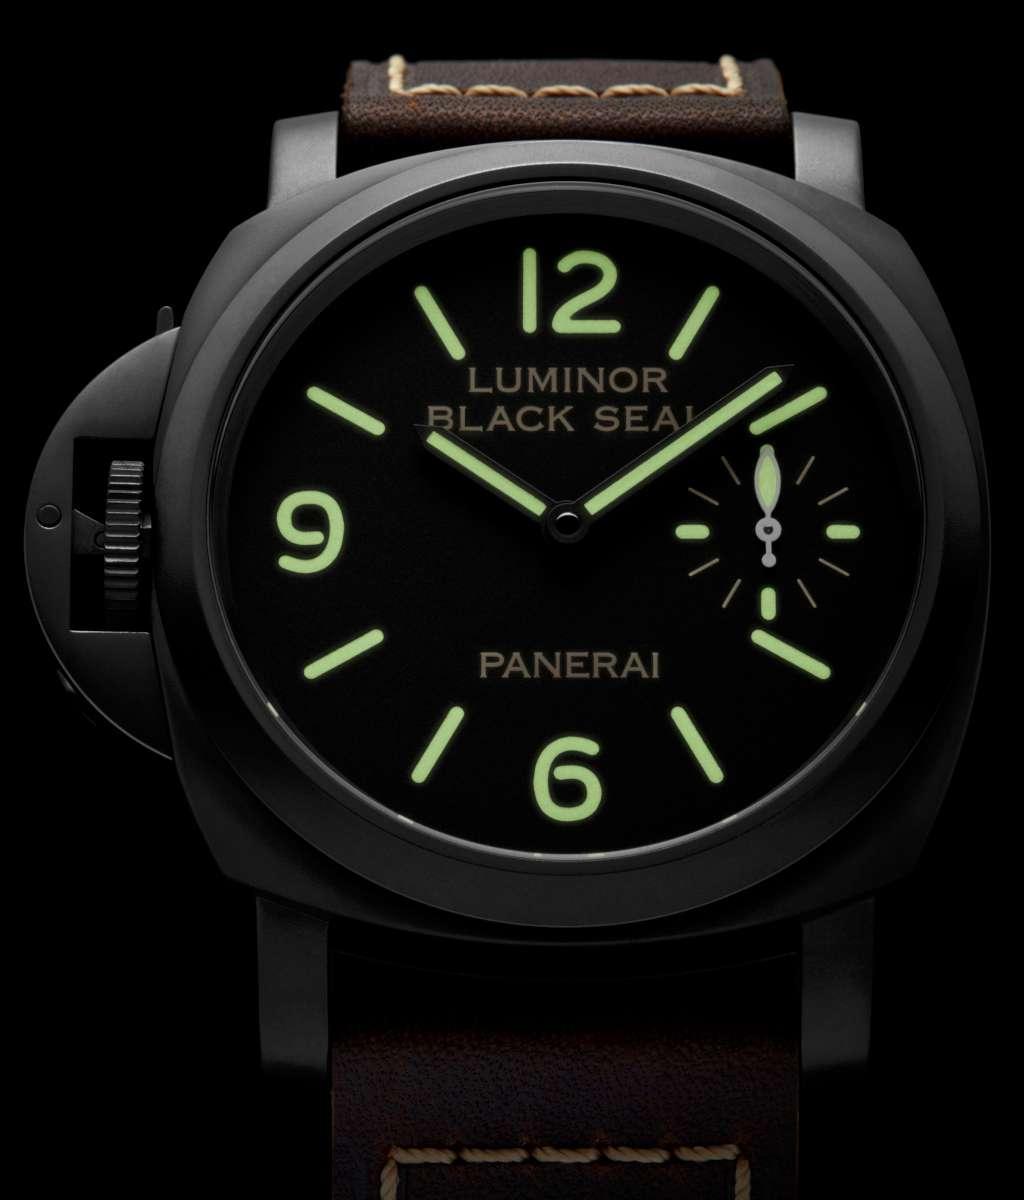 Superluminova是相當知名的夜光塗料,被大量運用在潛水錶的指針及時標上,提供腕錶在低光源的環境下依舊能夠保有良好的辨識度。